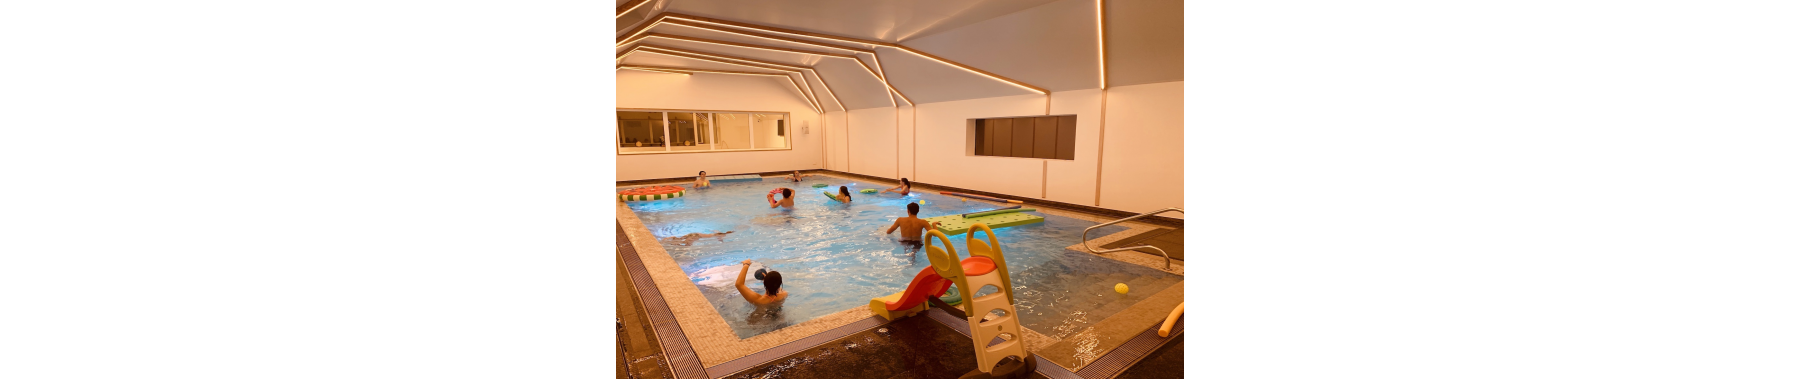 Location privative des piscines